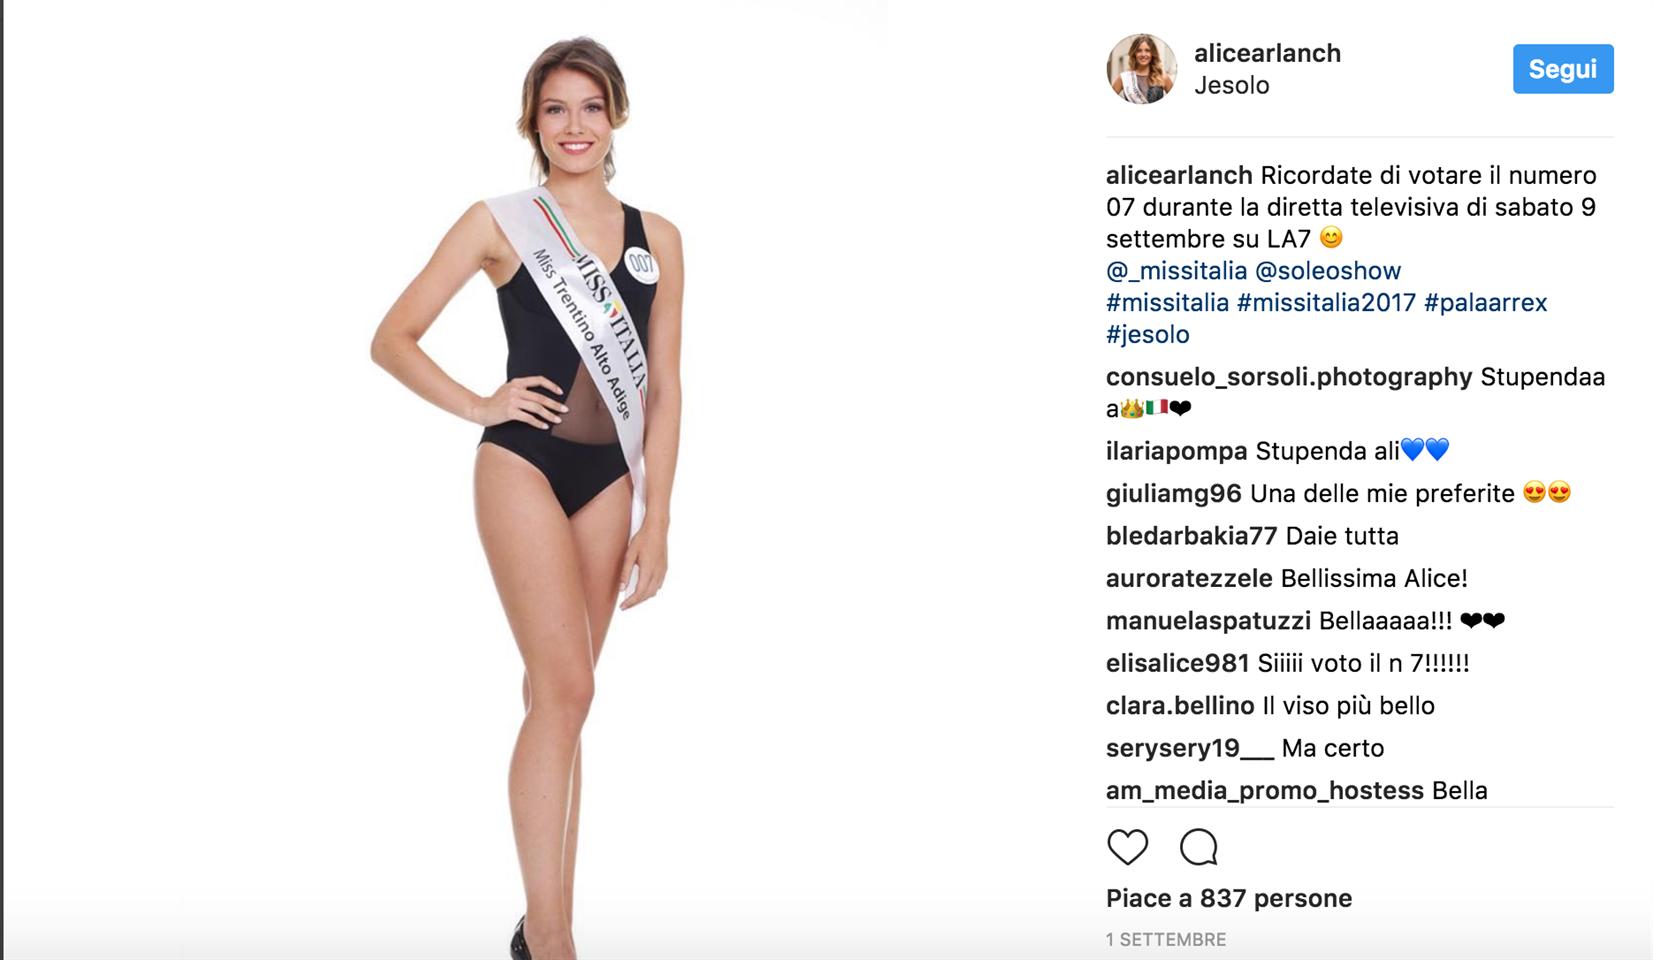 Miss Italia 2017 è Alice Rachele Arlanch